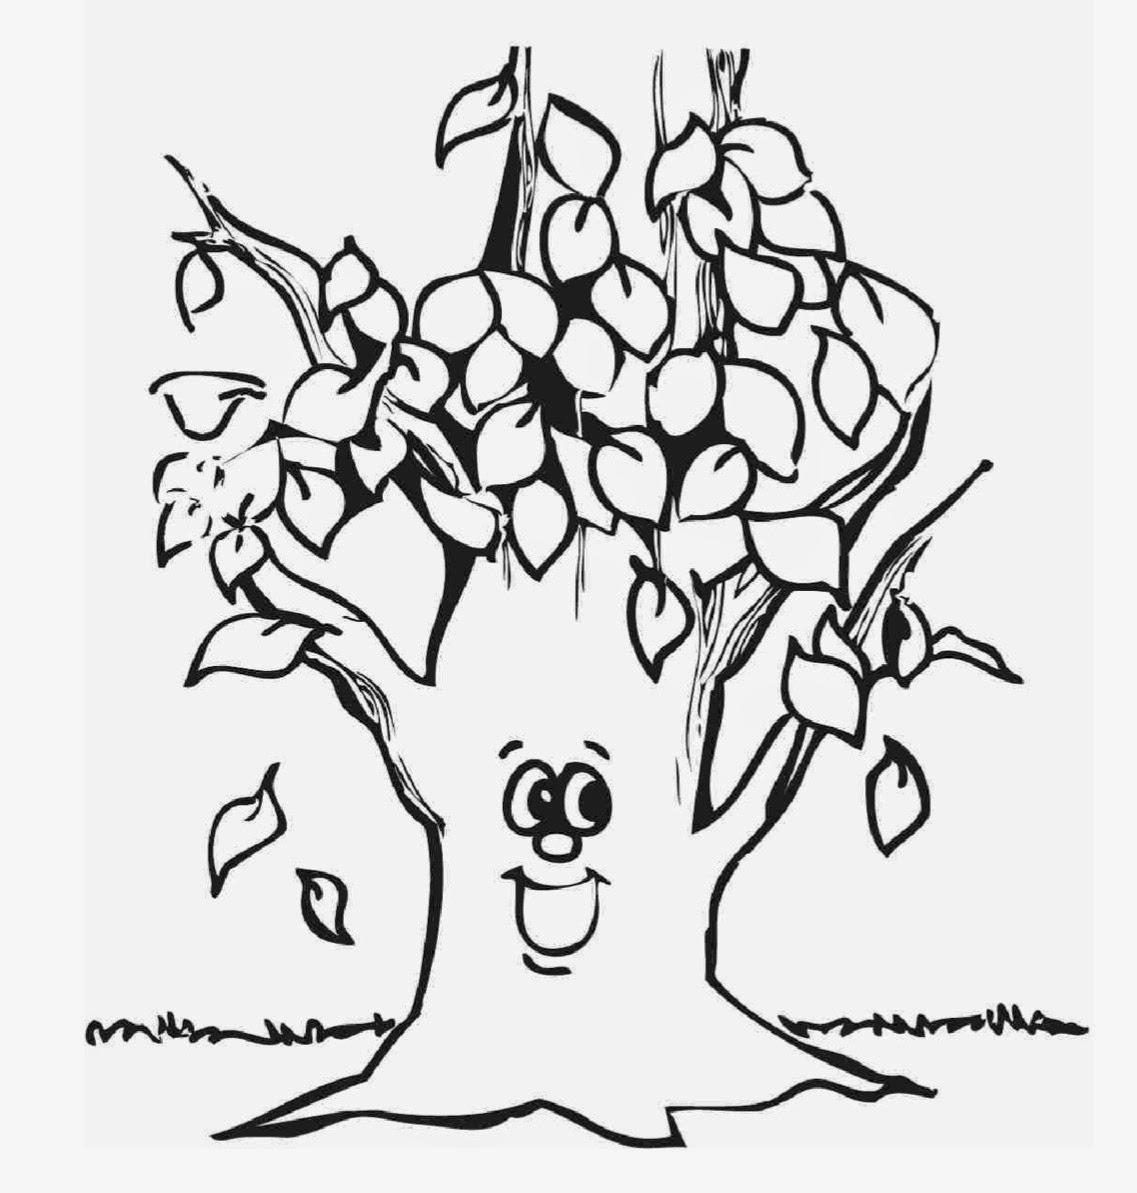 Animacion infantil sevilla y castillos hinchables sevilla for Que significa dibujar arboles secos